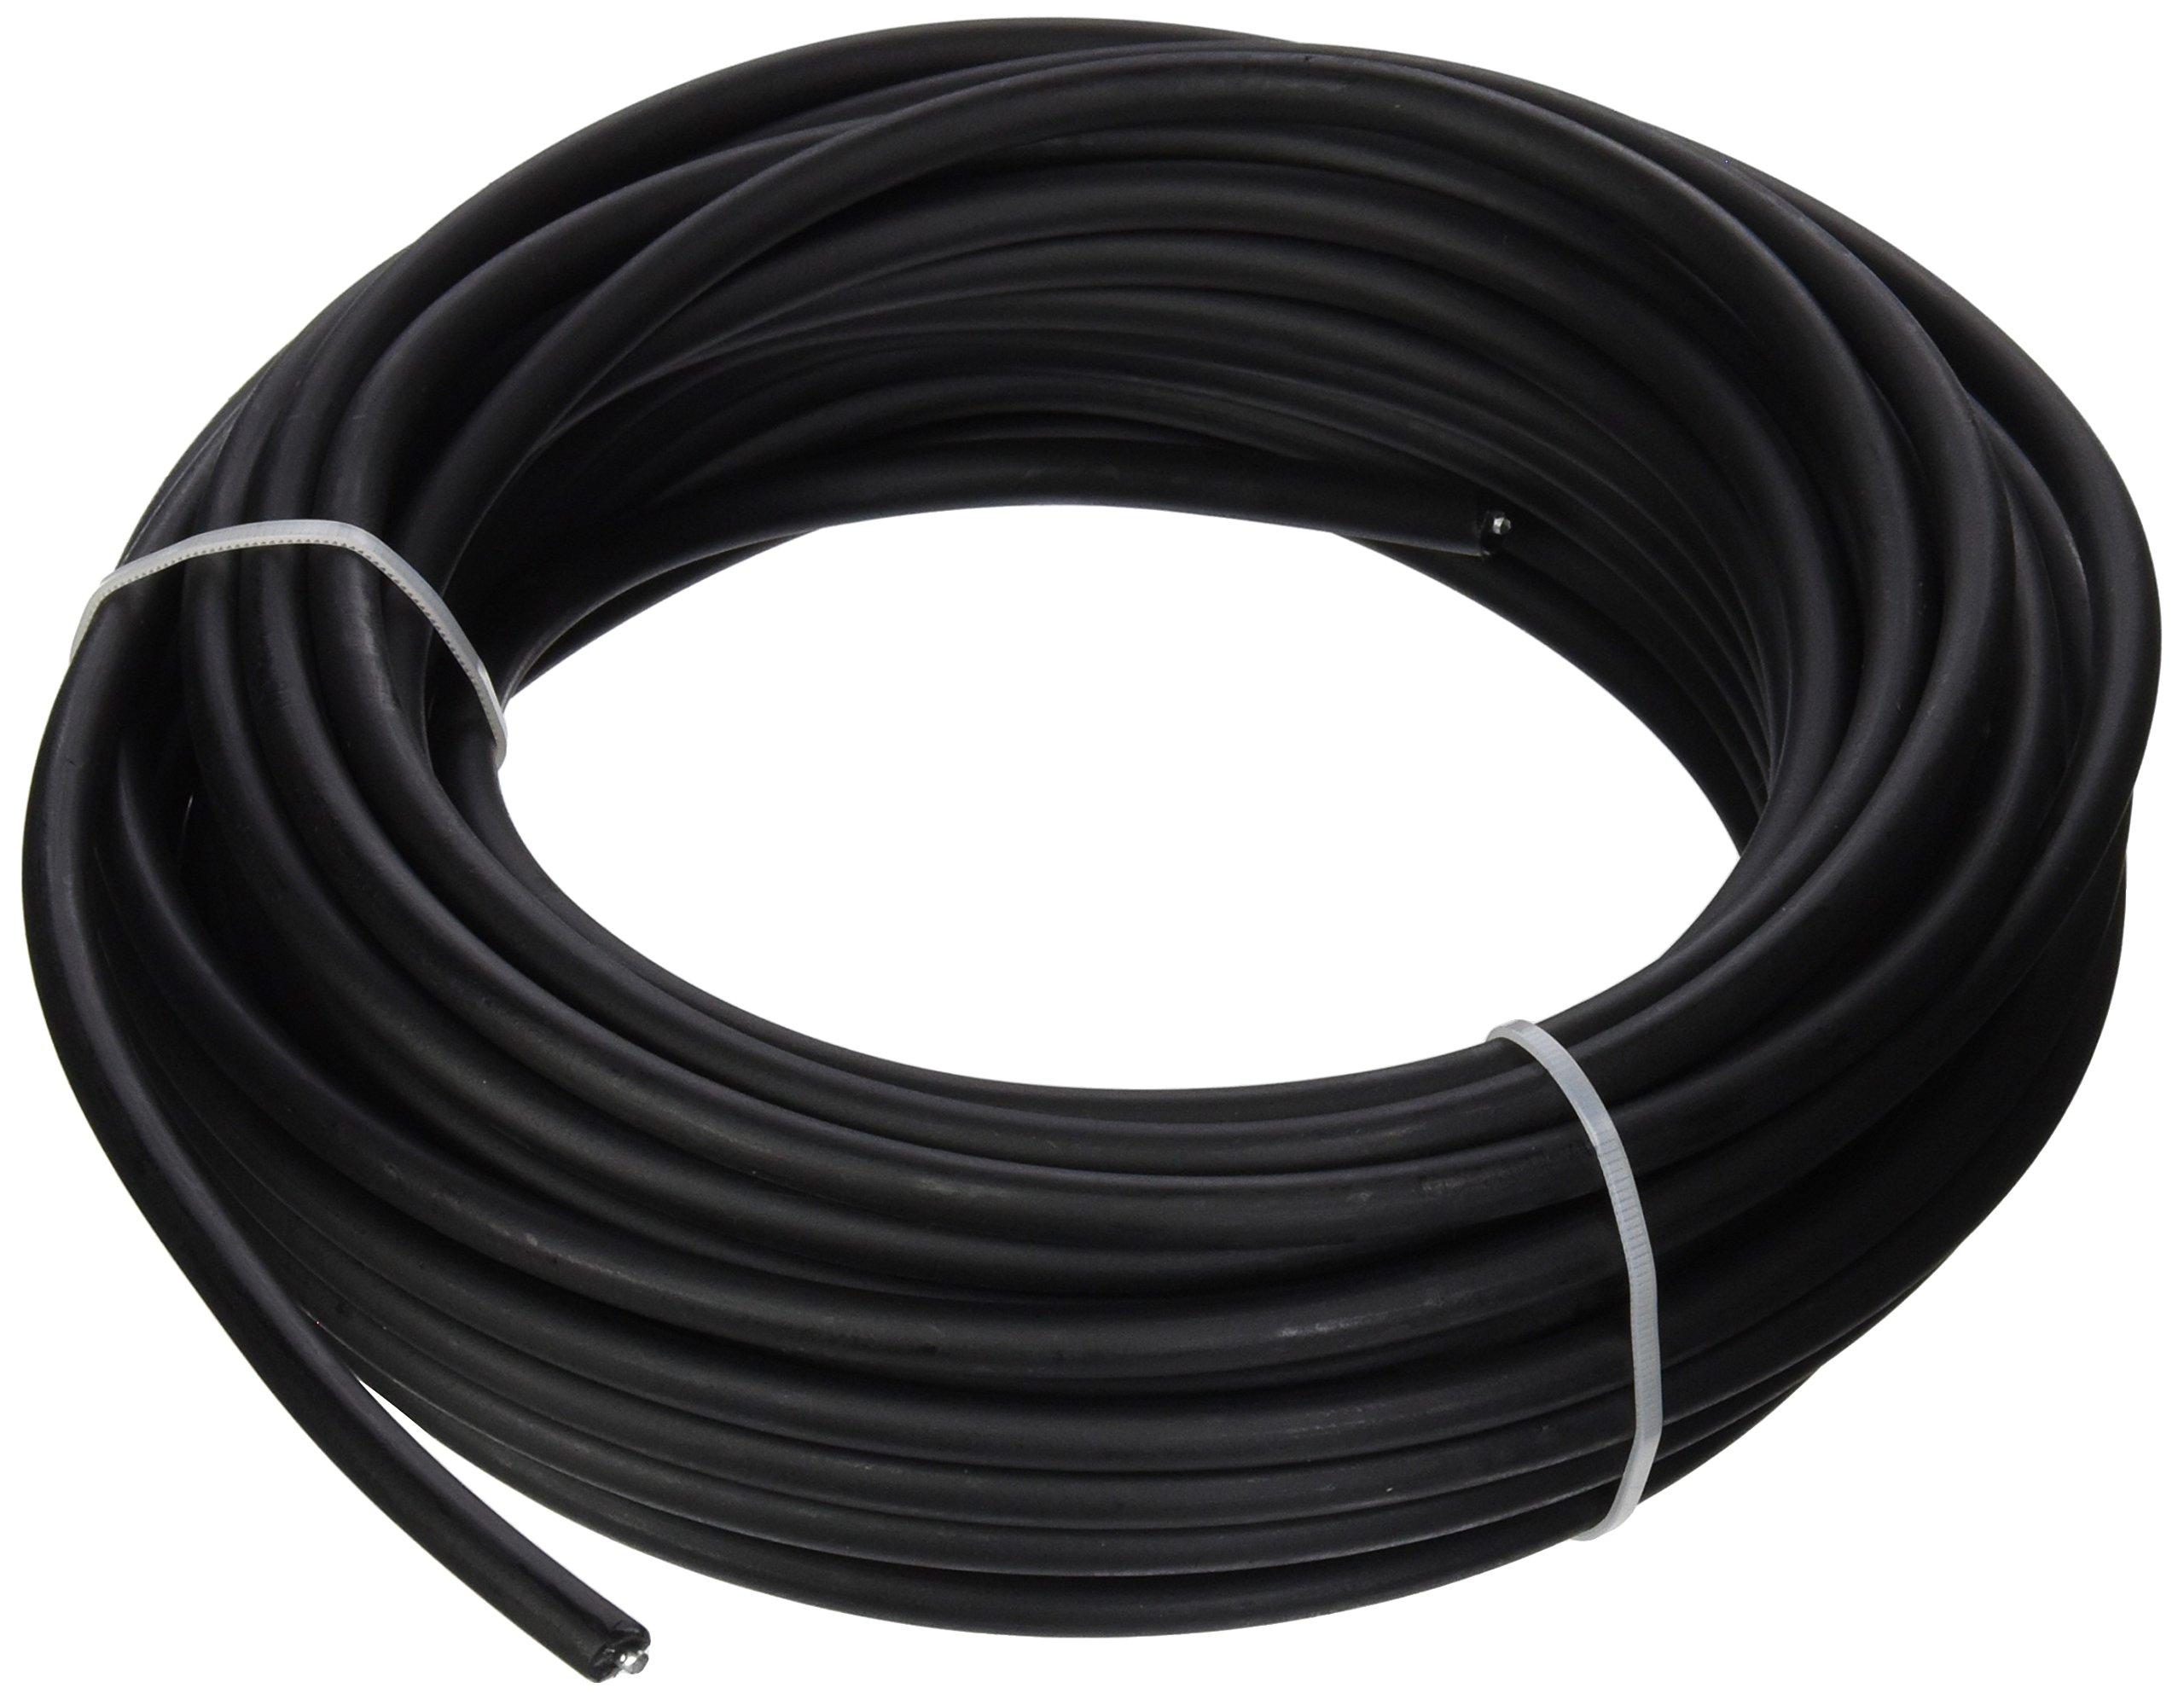 Fi-Shock UGC50 50' 121/2 Gauge Hook Up Underground Controller Wire (4 Pack), 4 Reels